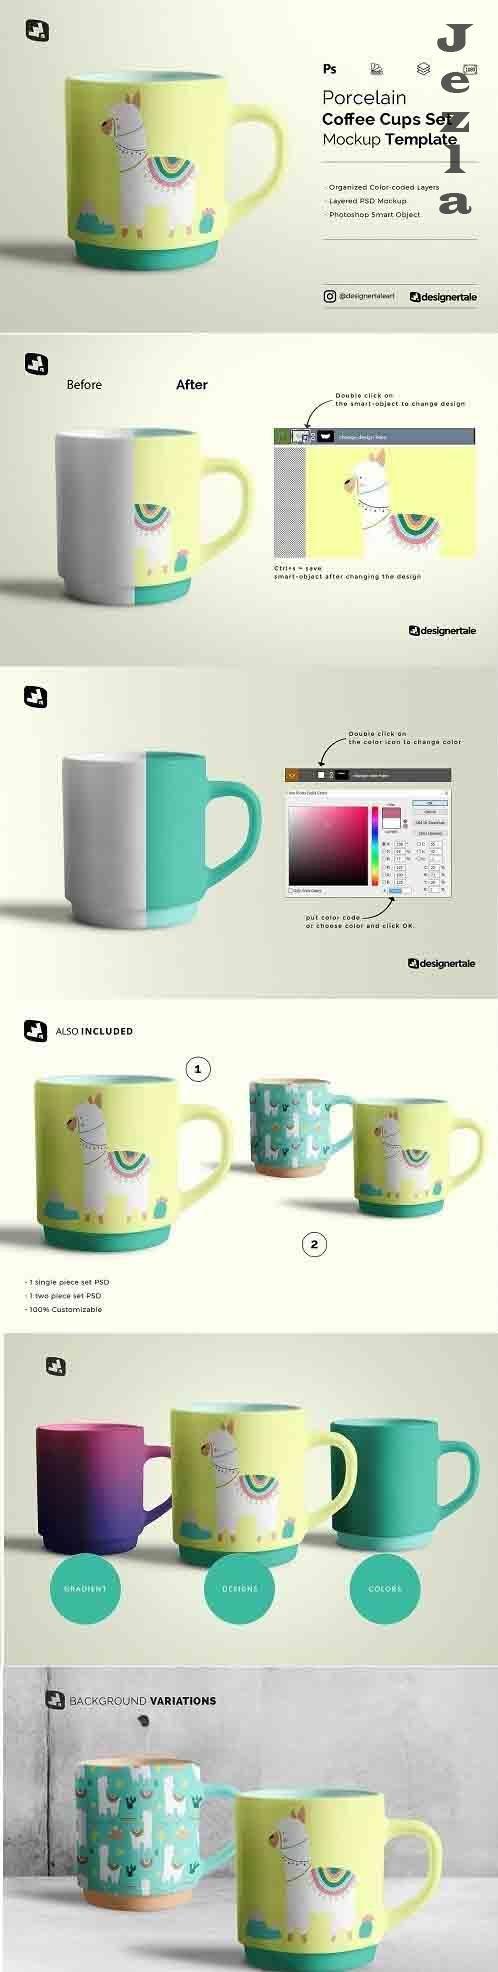 CreativeMarket - Porcelain Coffee Cups Set Mockup 5188654